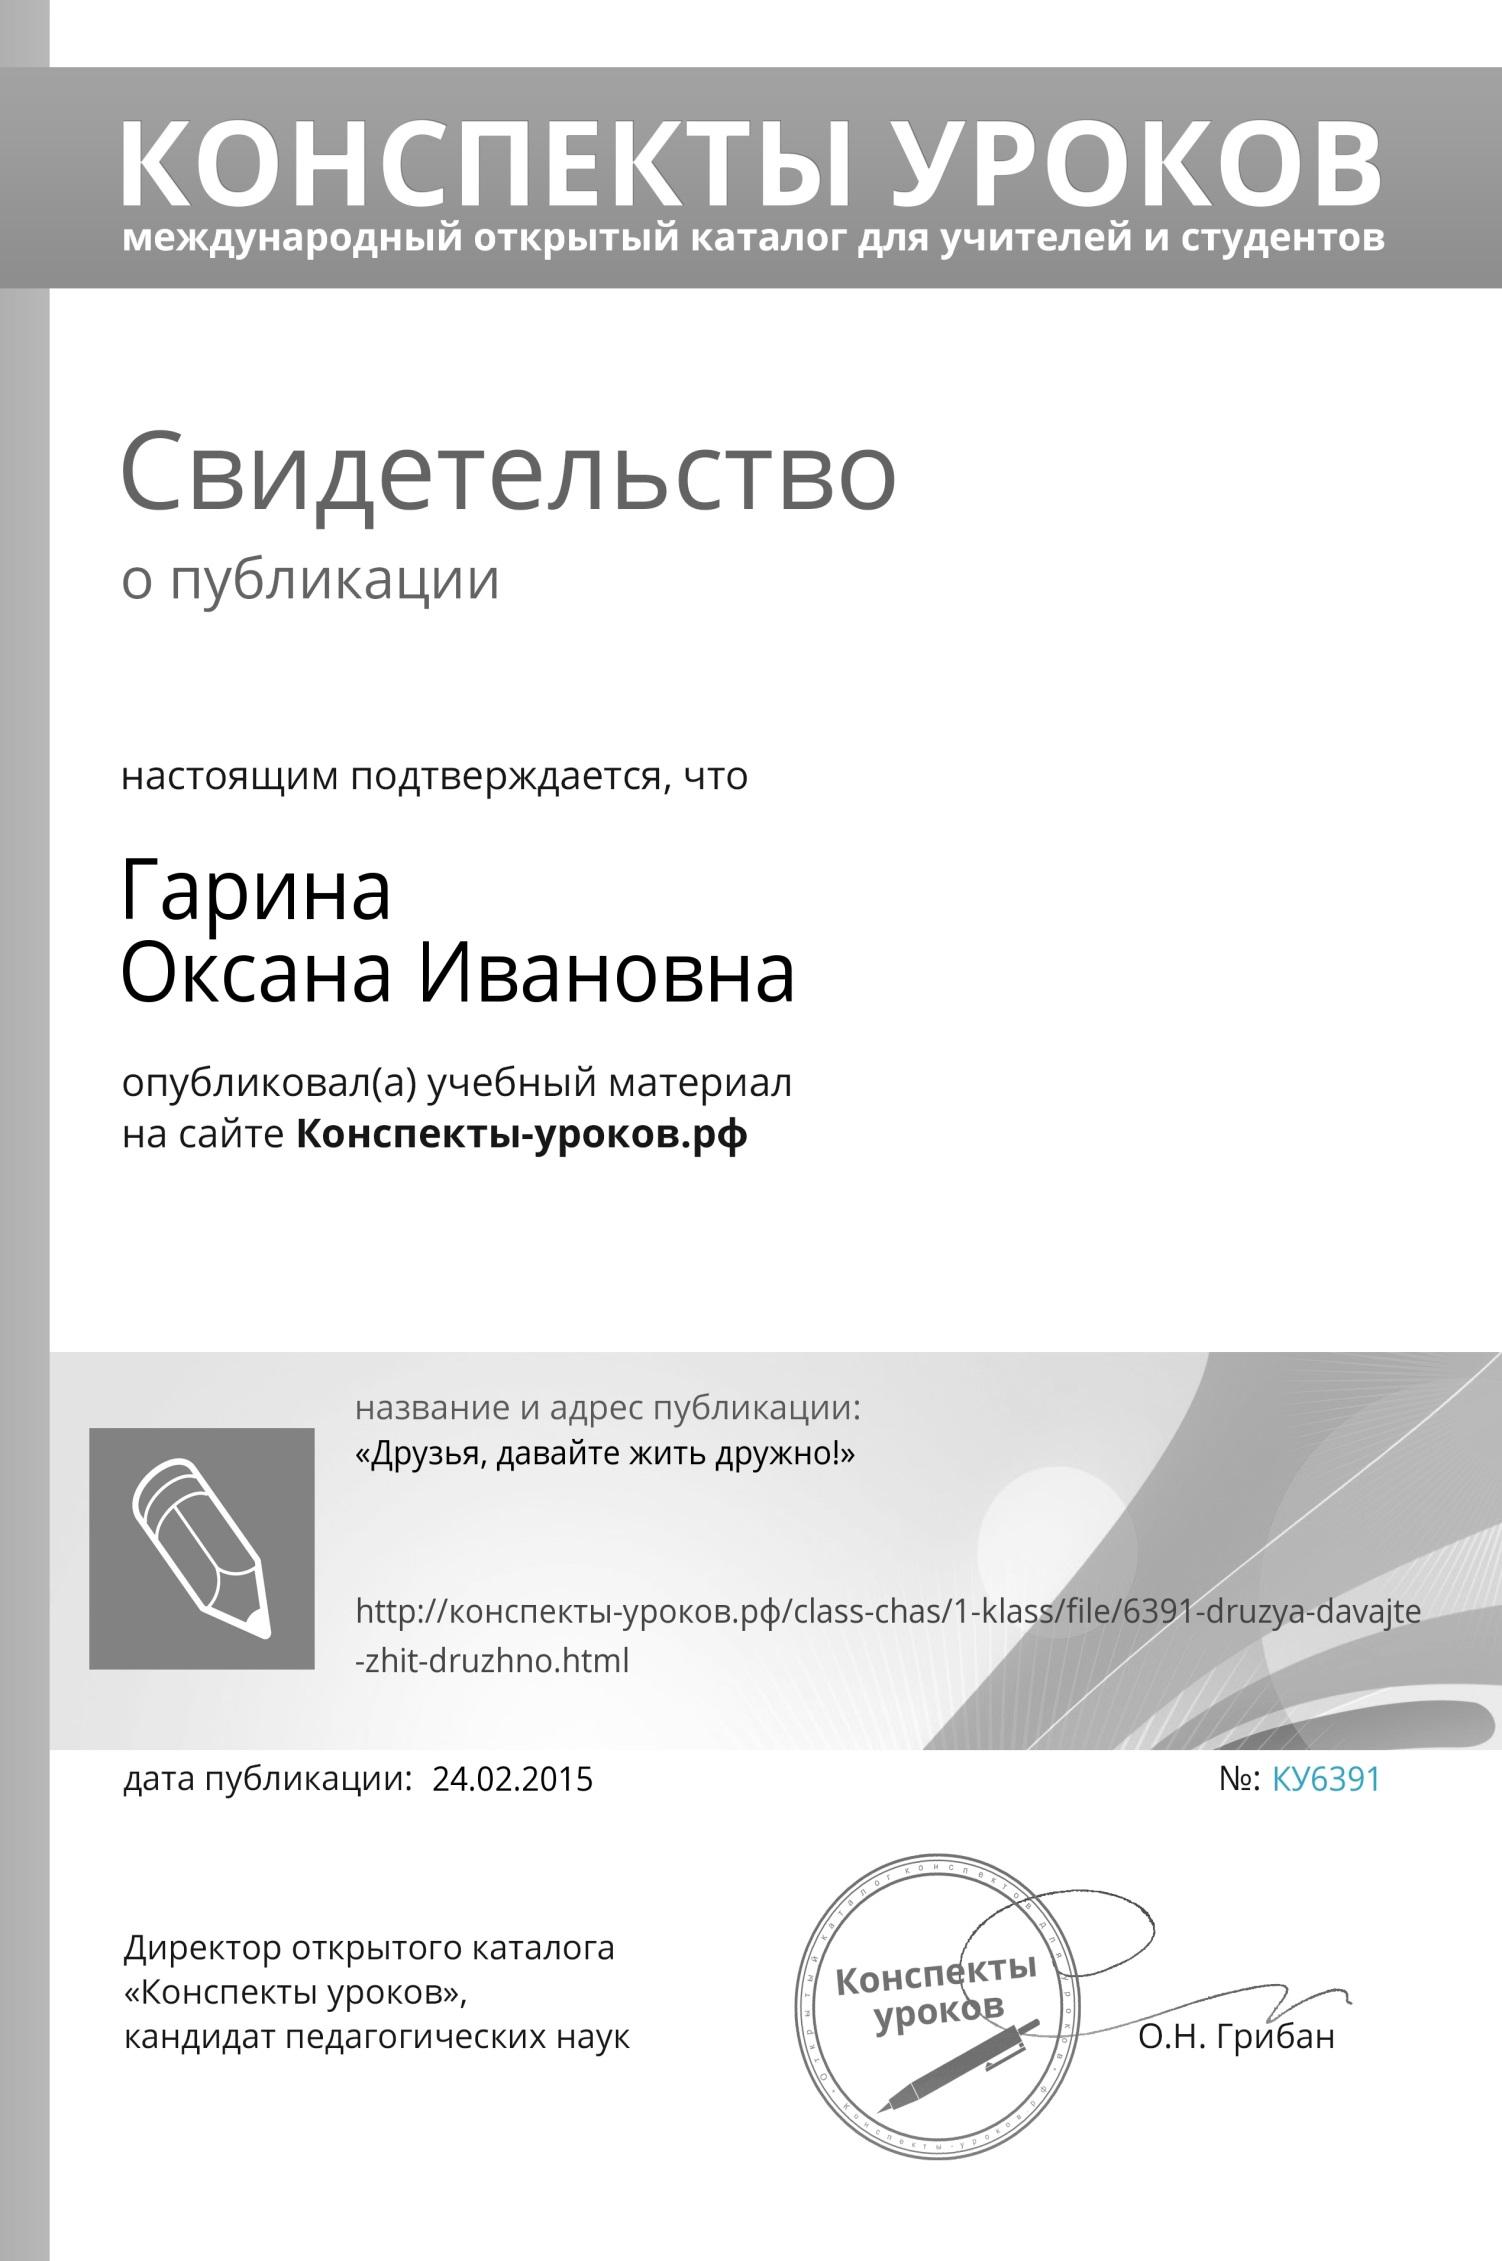 http://xn----dtbhtbbrhebfpirq0k.xn--p1ai/certificates/getimage.php?491e8869a878faa0a75a4274bcd4d796